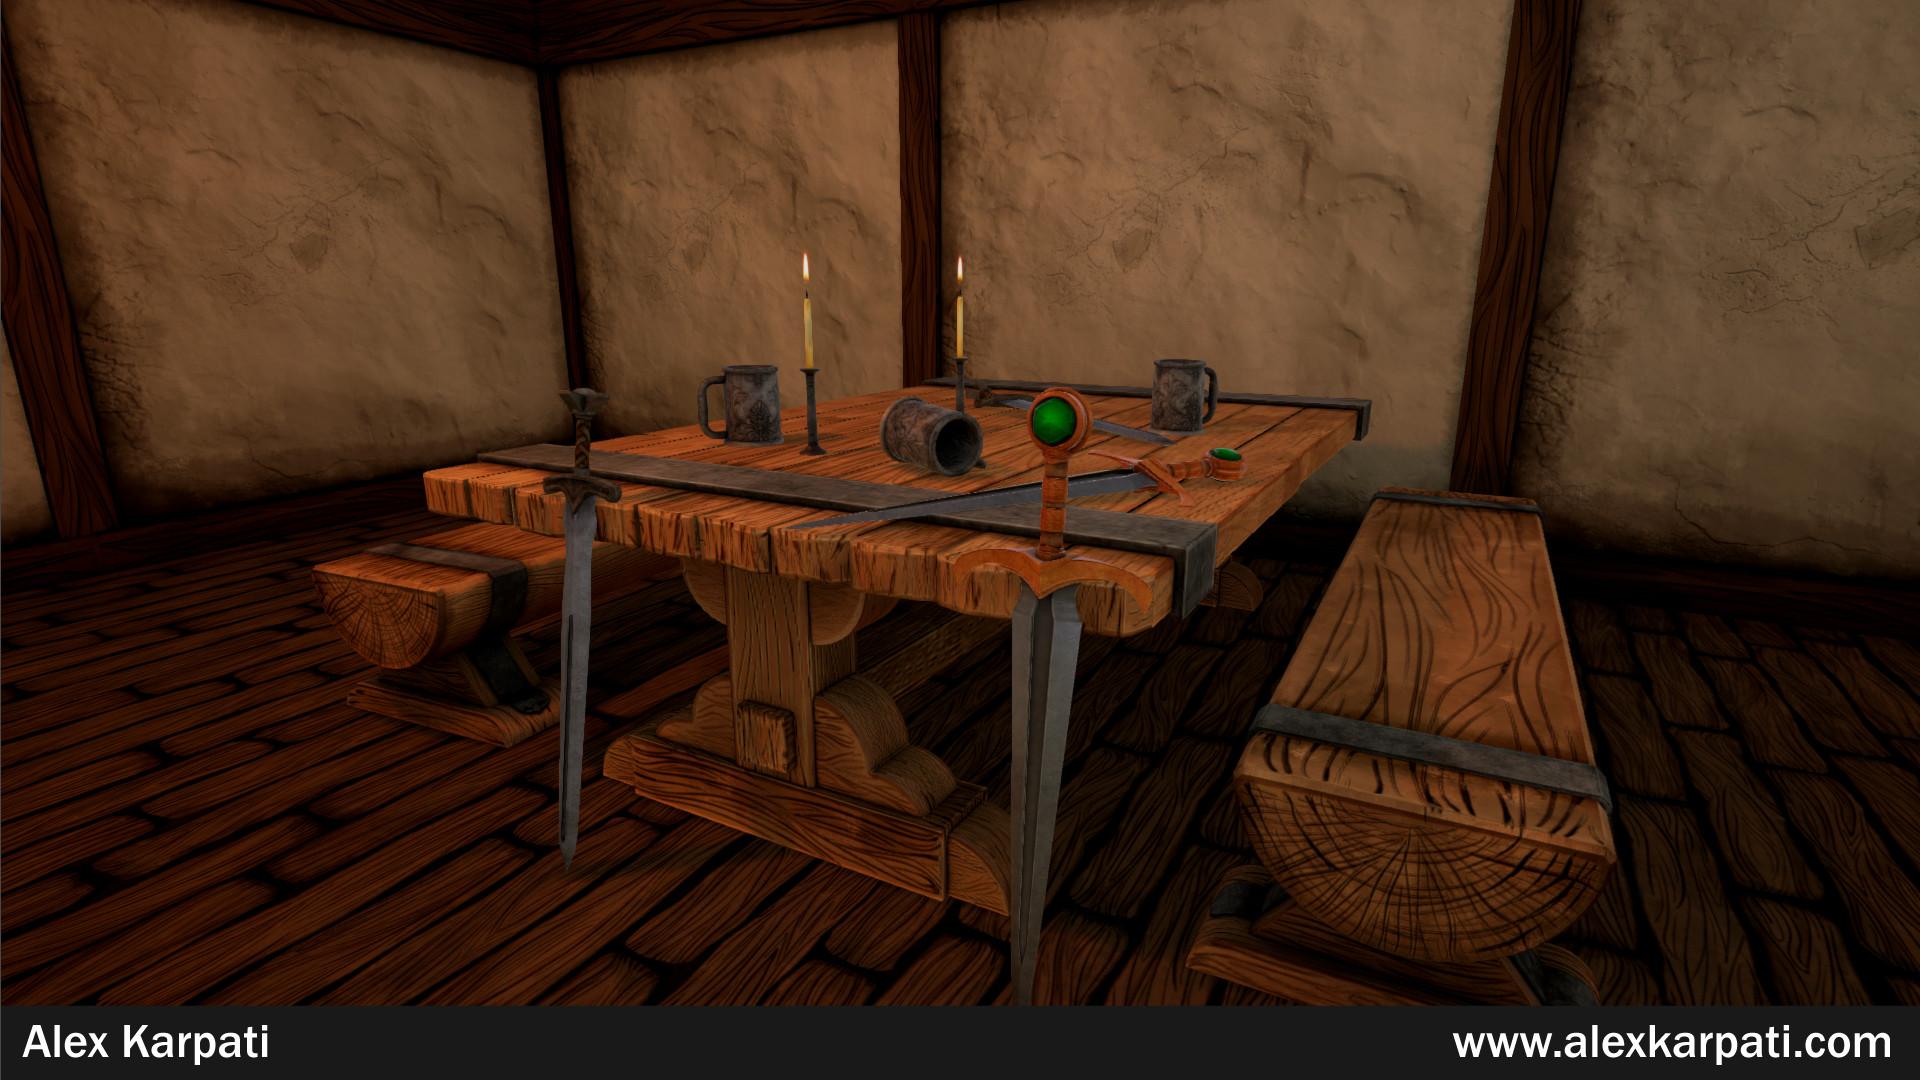 Alex karpati tavern 01 v01